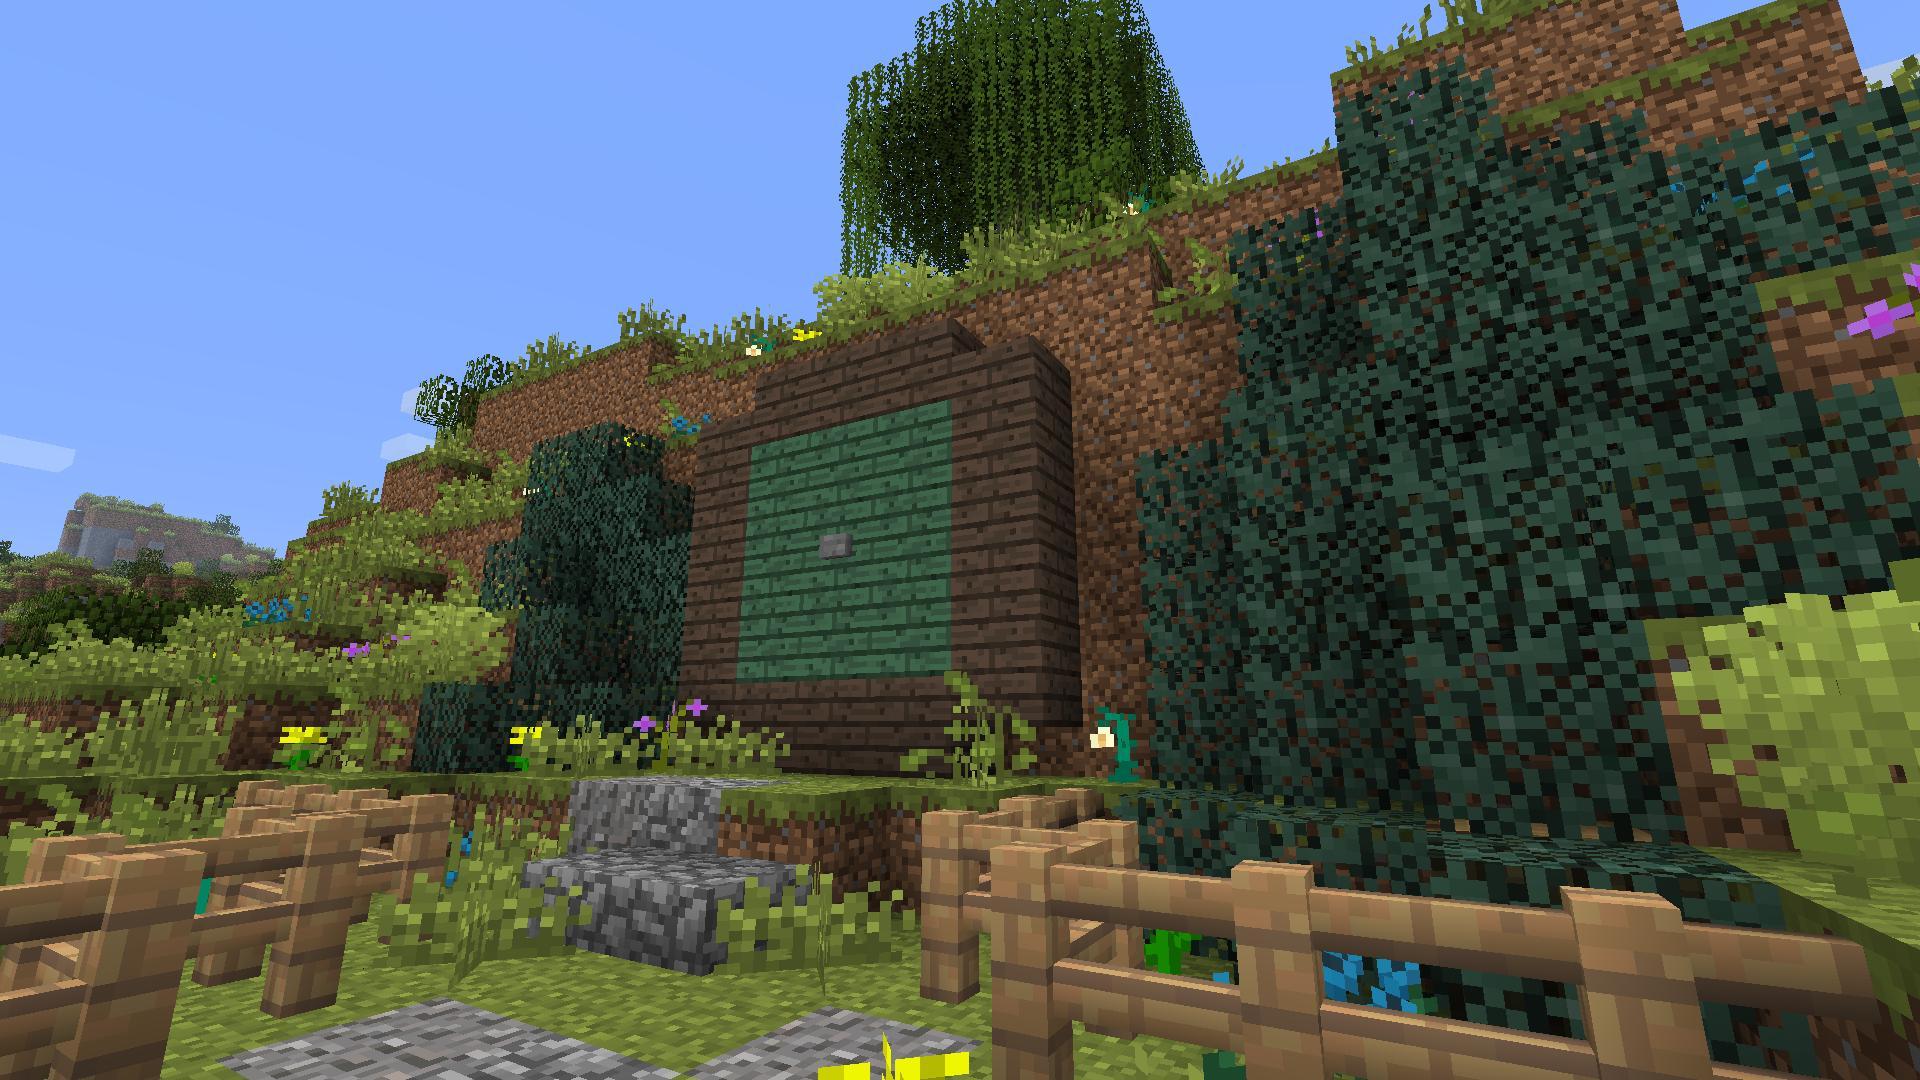 Forestry Mod - 1 7 10 | Minecraft Modinstaller